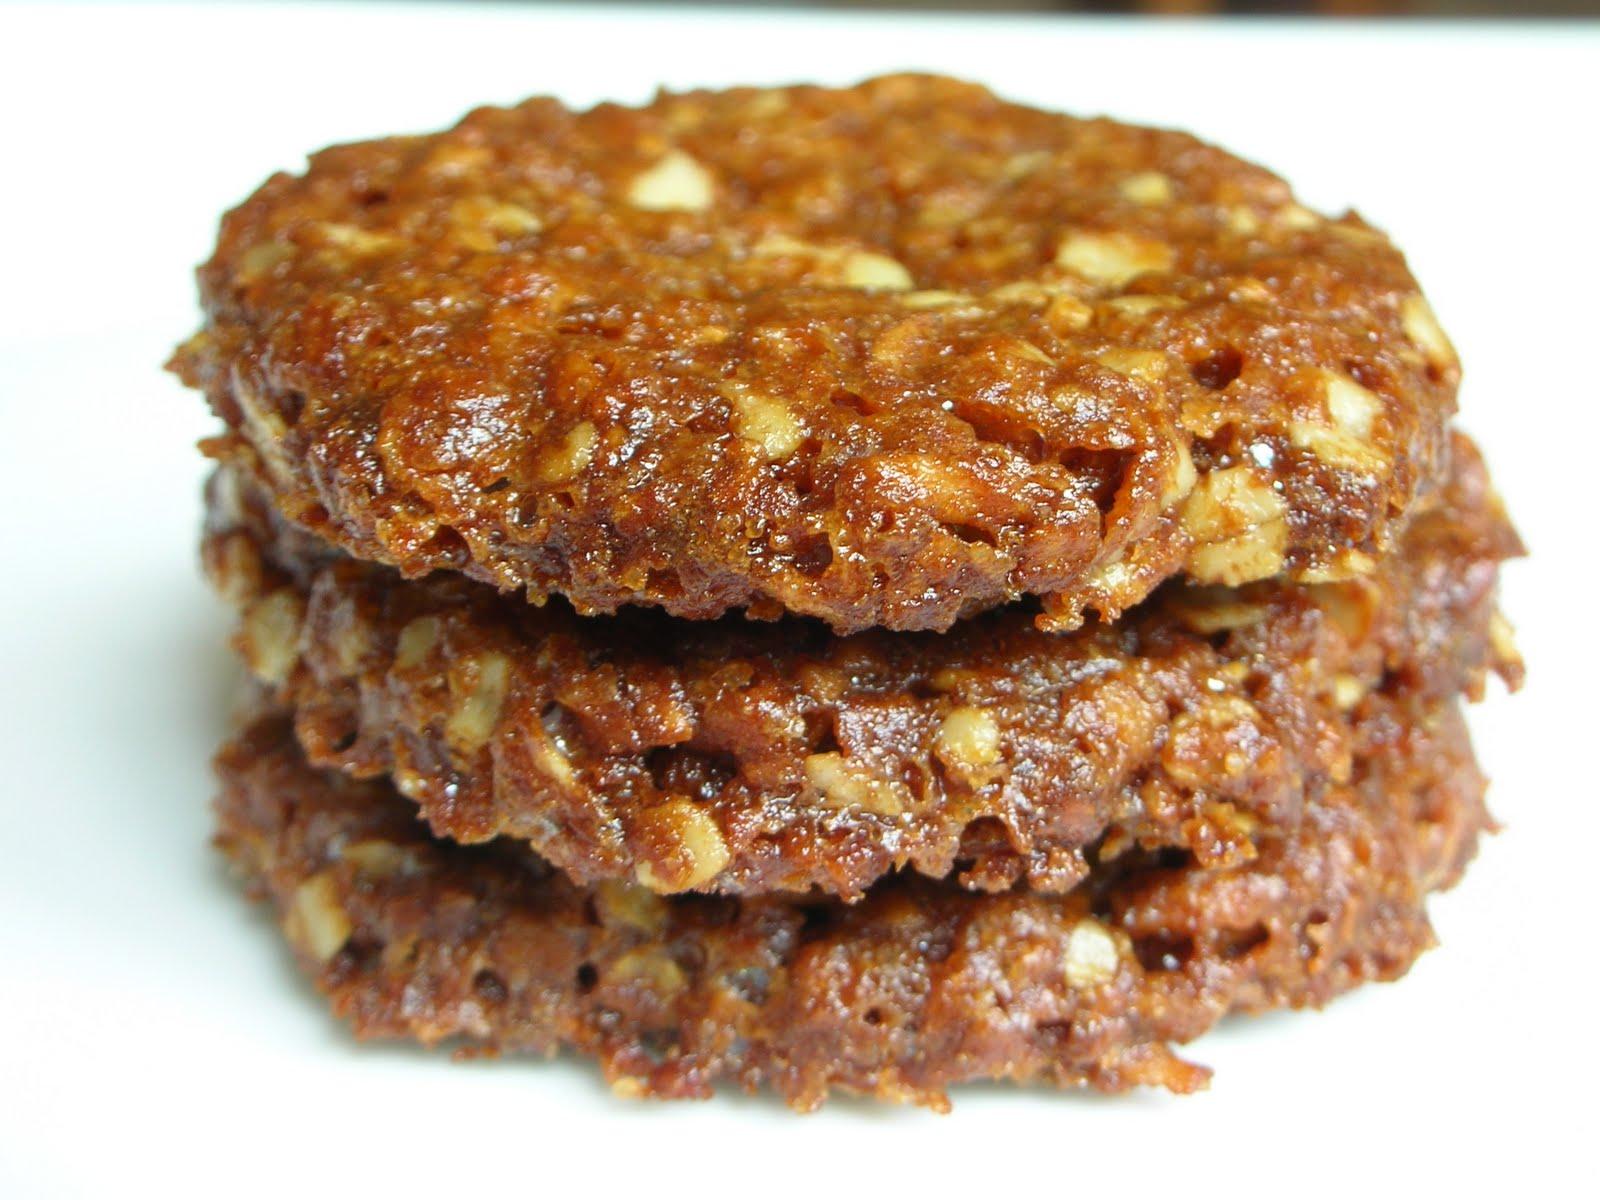 ... Good Eats: Coconut oat molasses cookie/biscuit (modified ANZAC) recipe